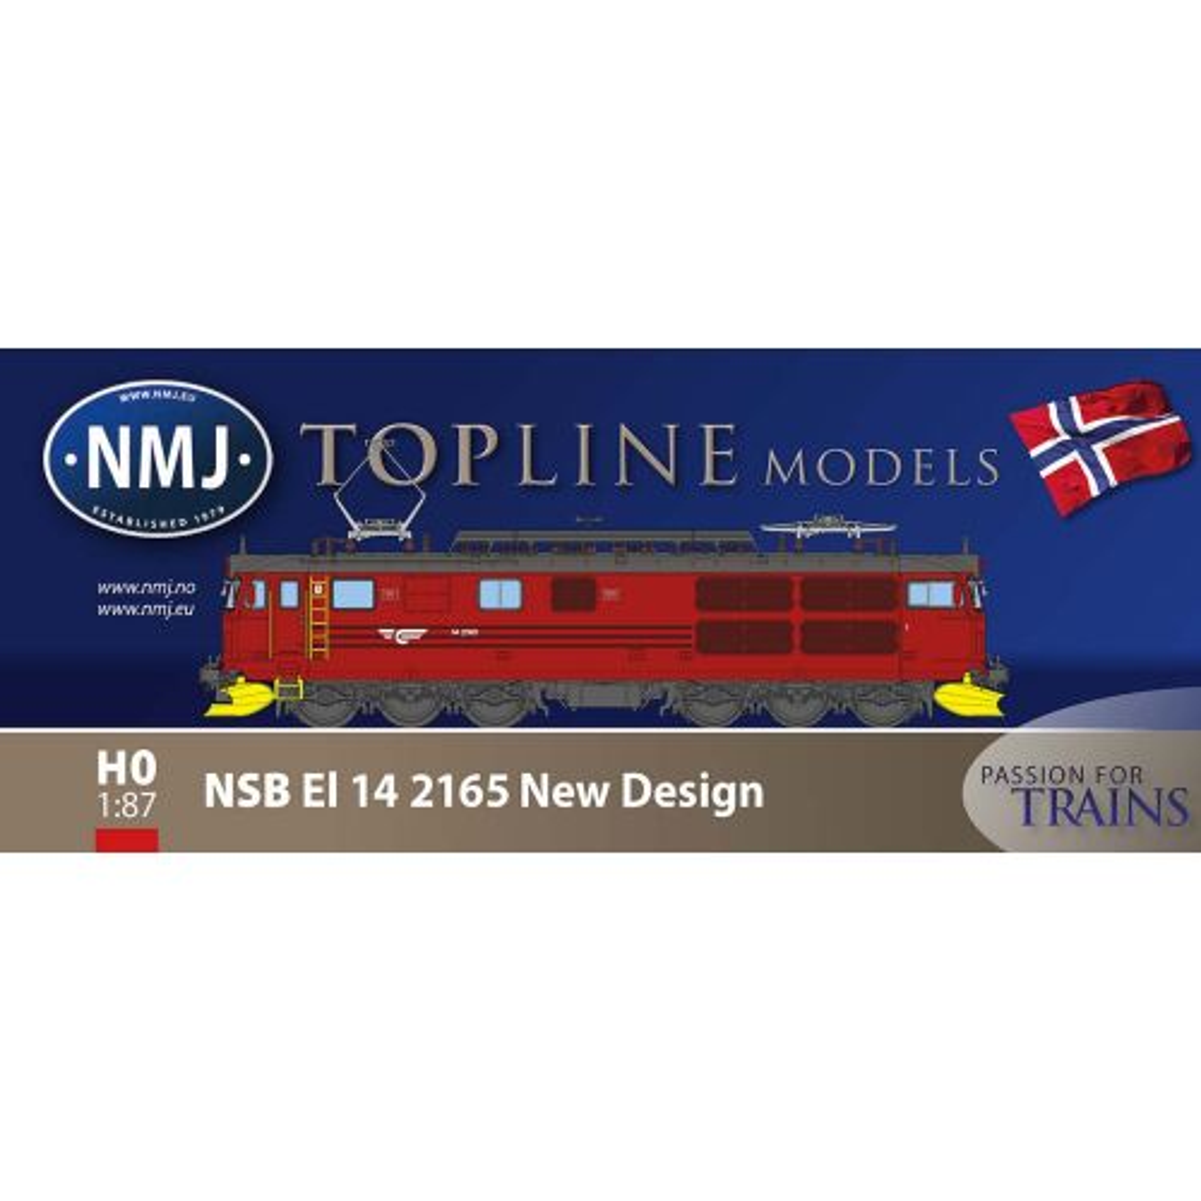 Topline Lokomotiver, nmj-topline-93104-nsb-el14-2165-red-black-livery-v2-dc, NMJT93104